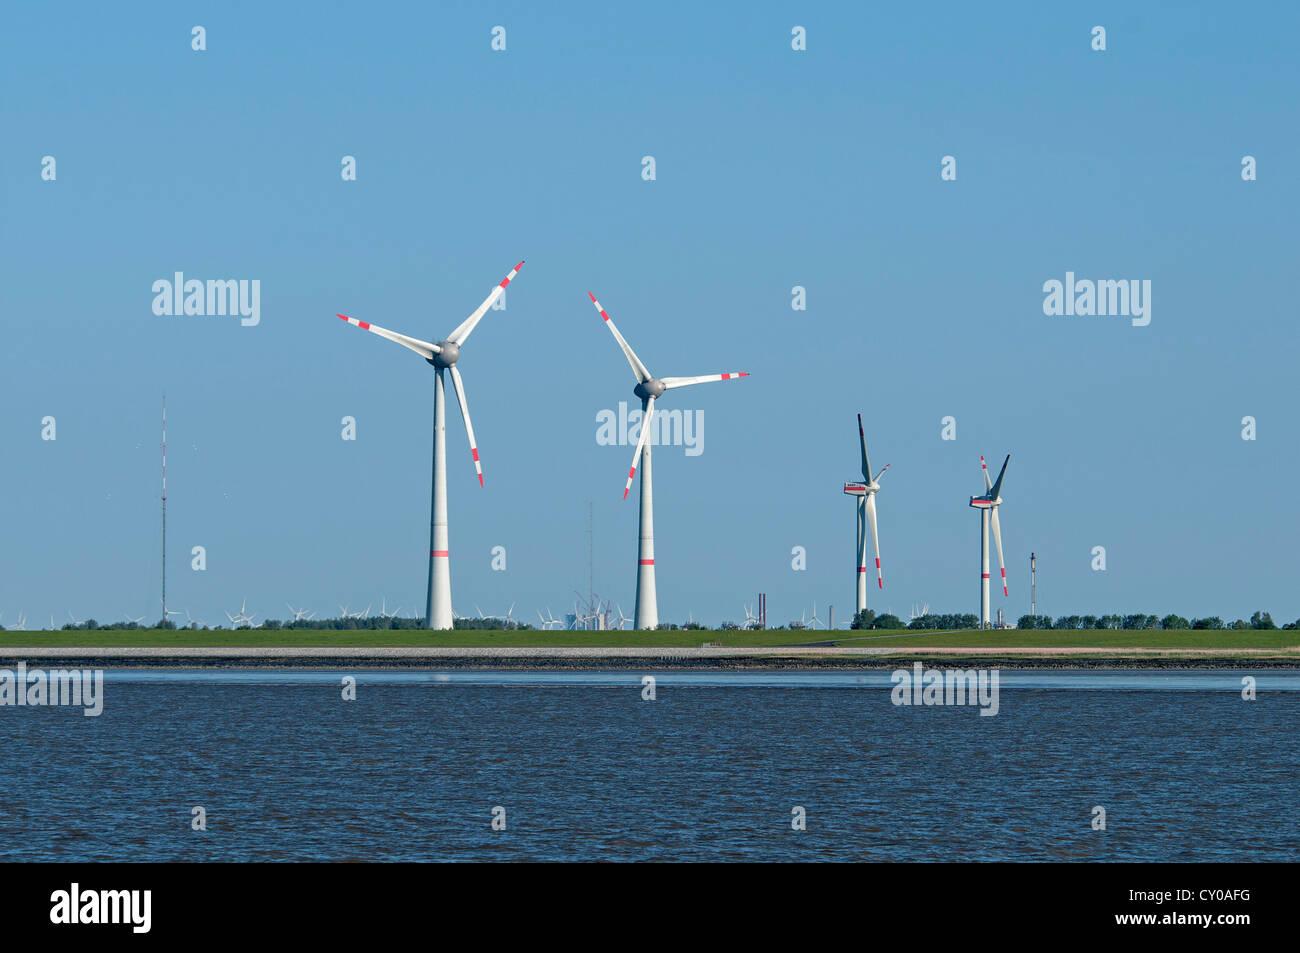 Wind turbines on the coast, renewable energy, East Frisia, Lower Saxony - Stock Image